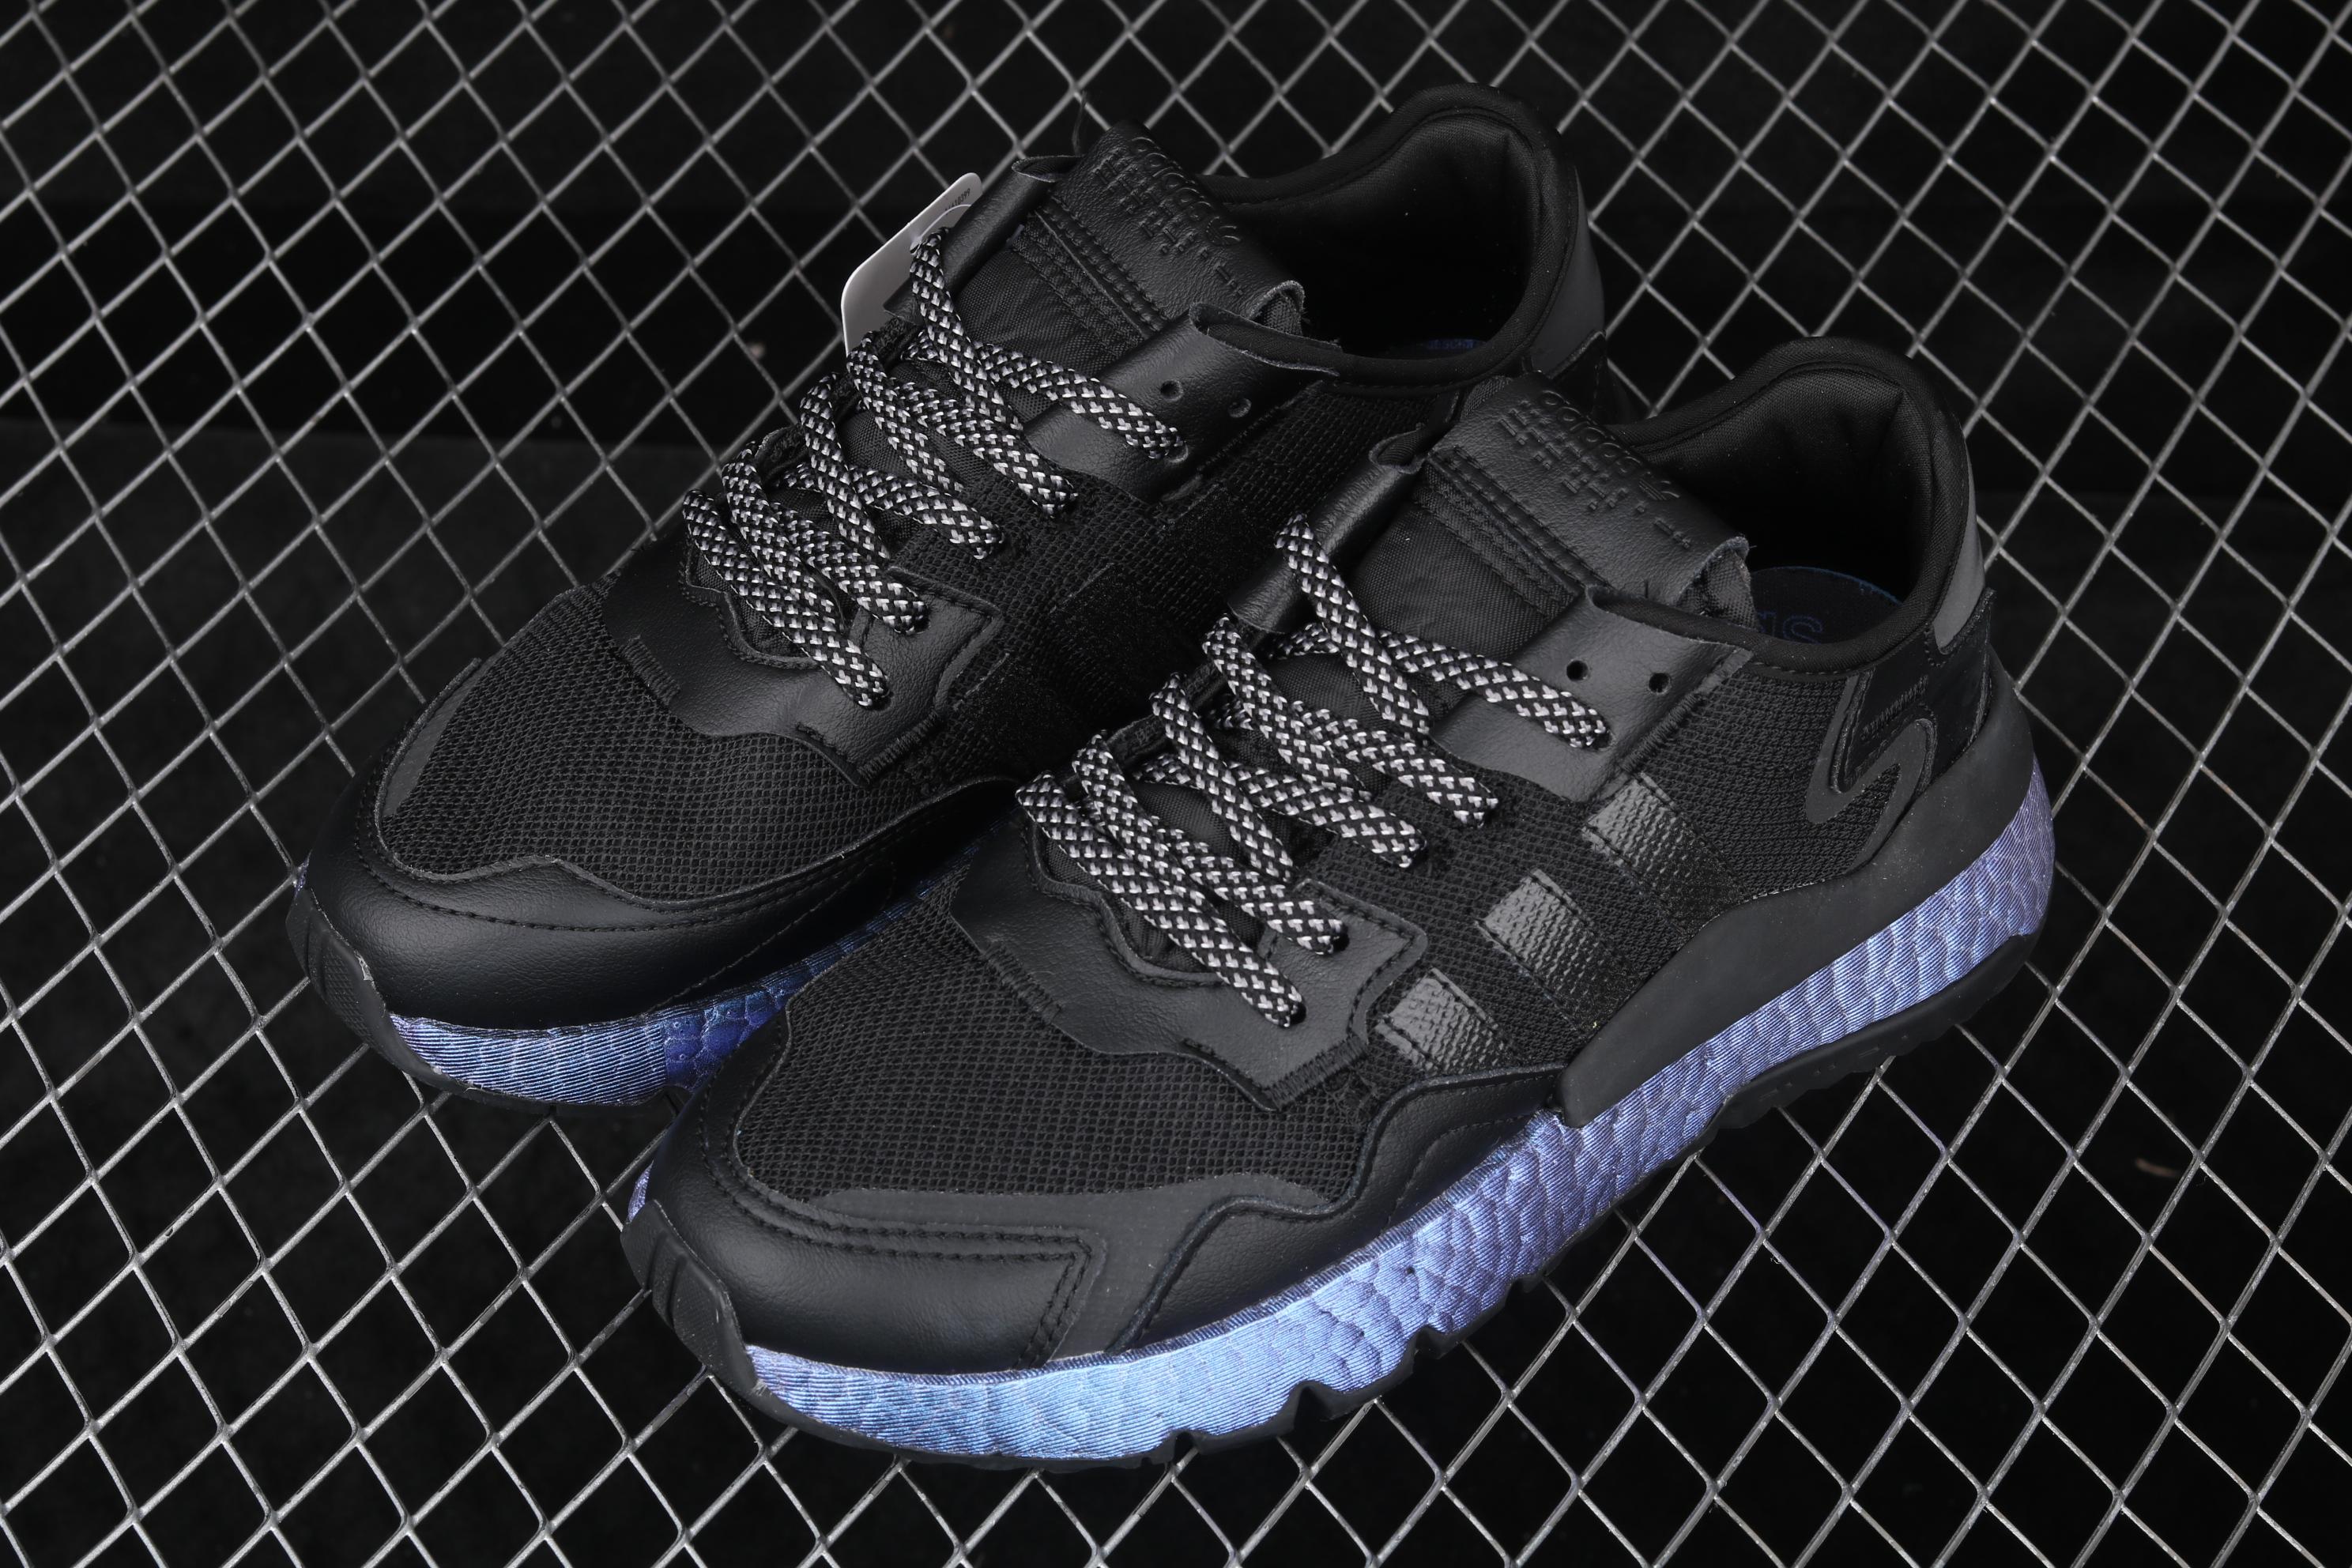 Ad Nite Jogger 2019 Boost FV3615 3M反光复古跑鞋